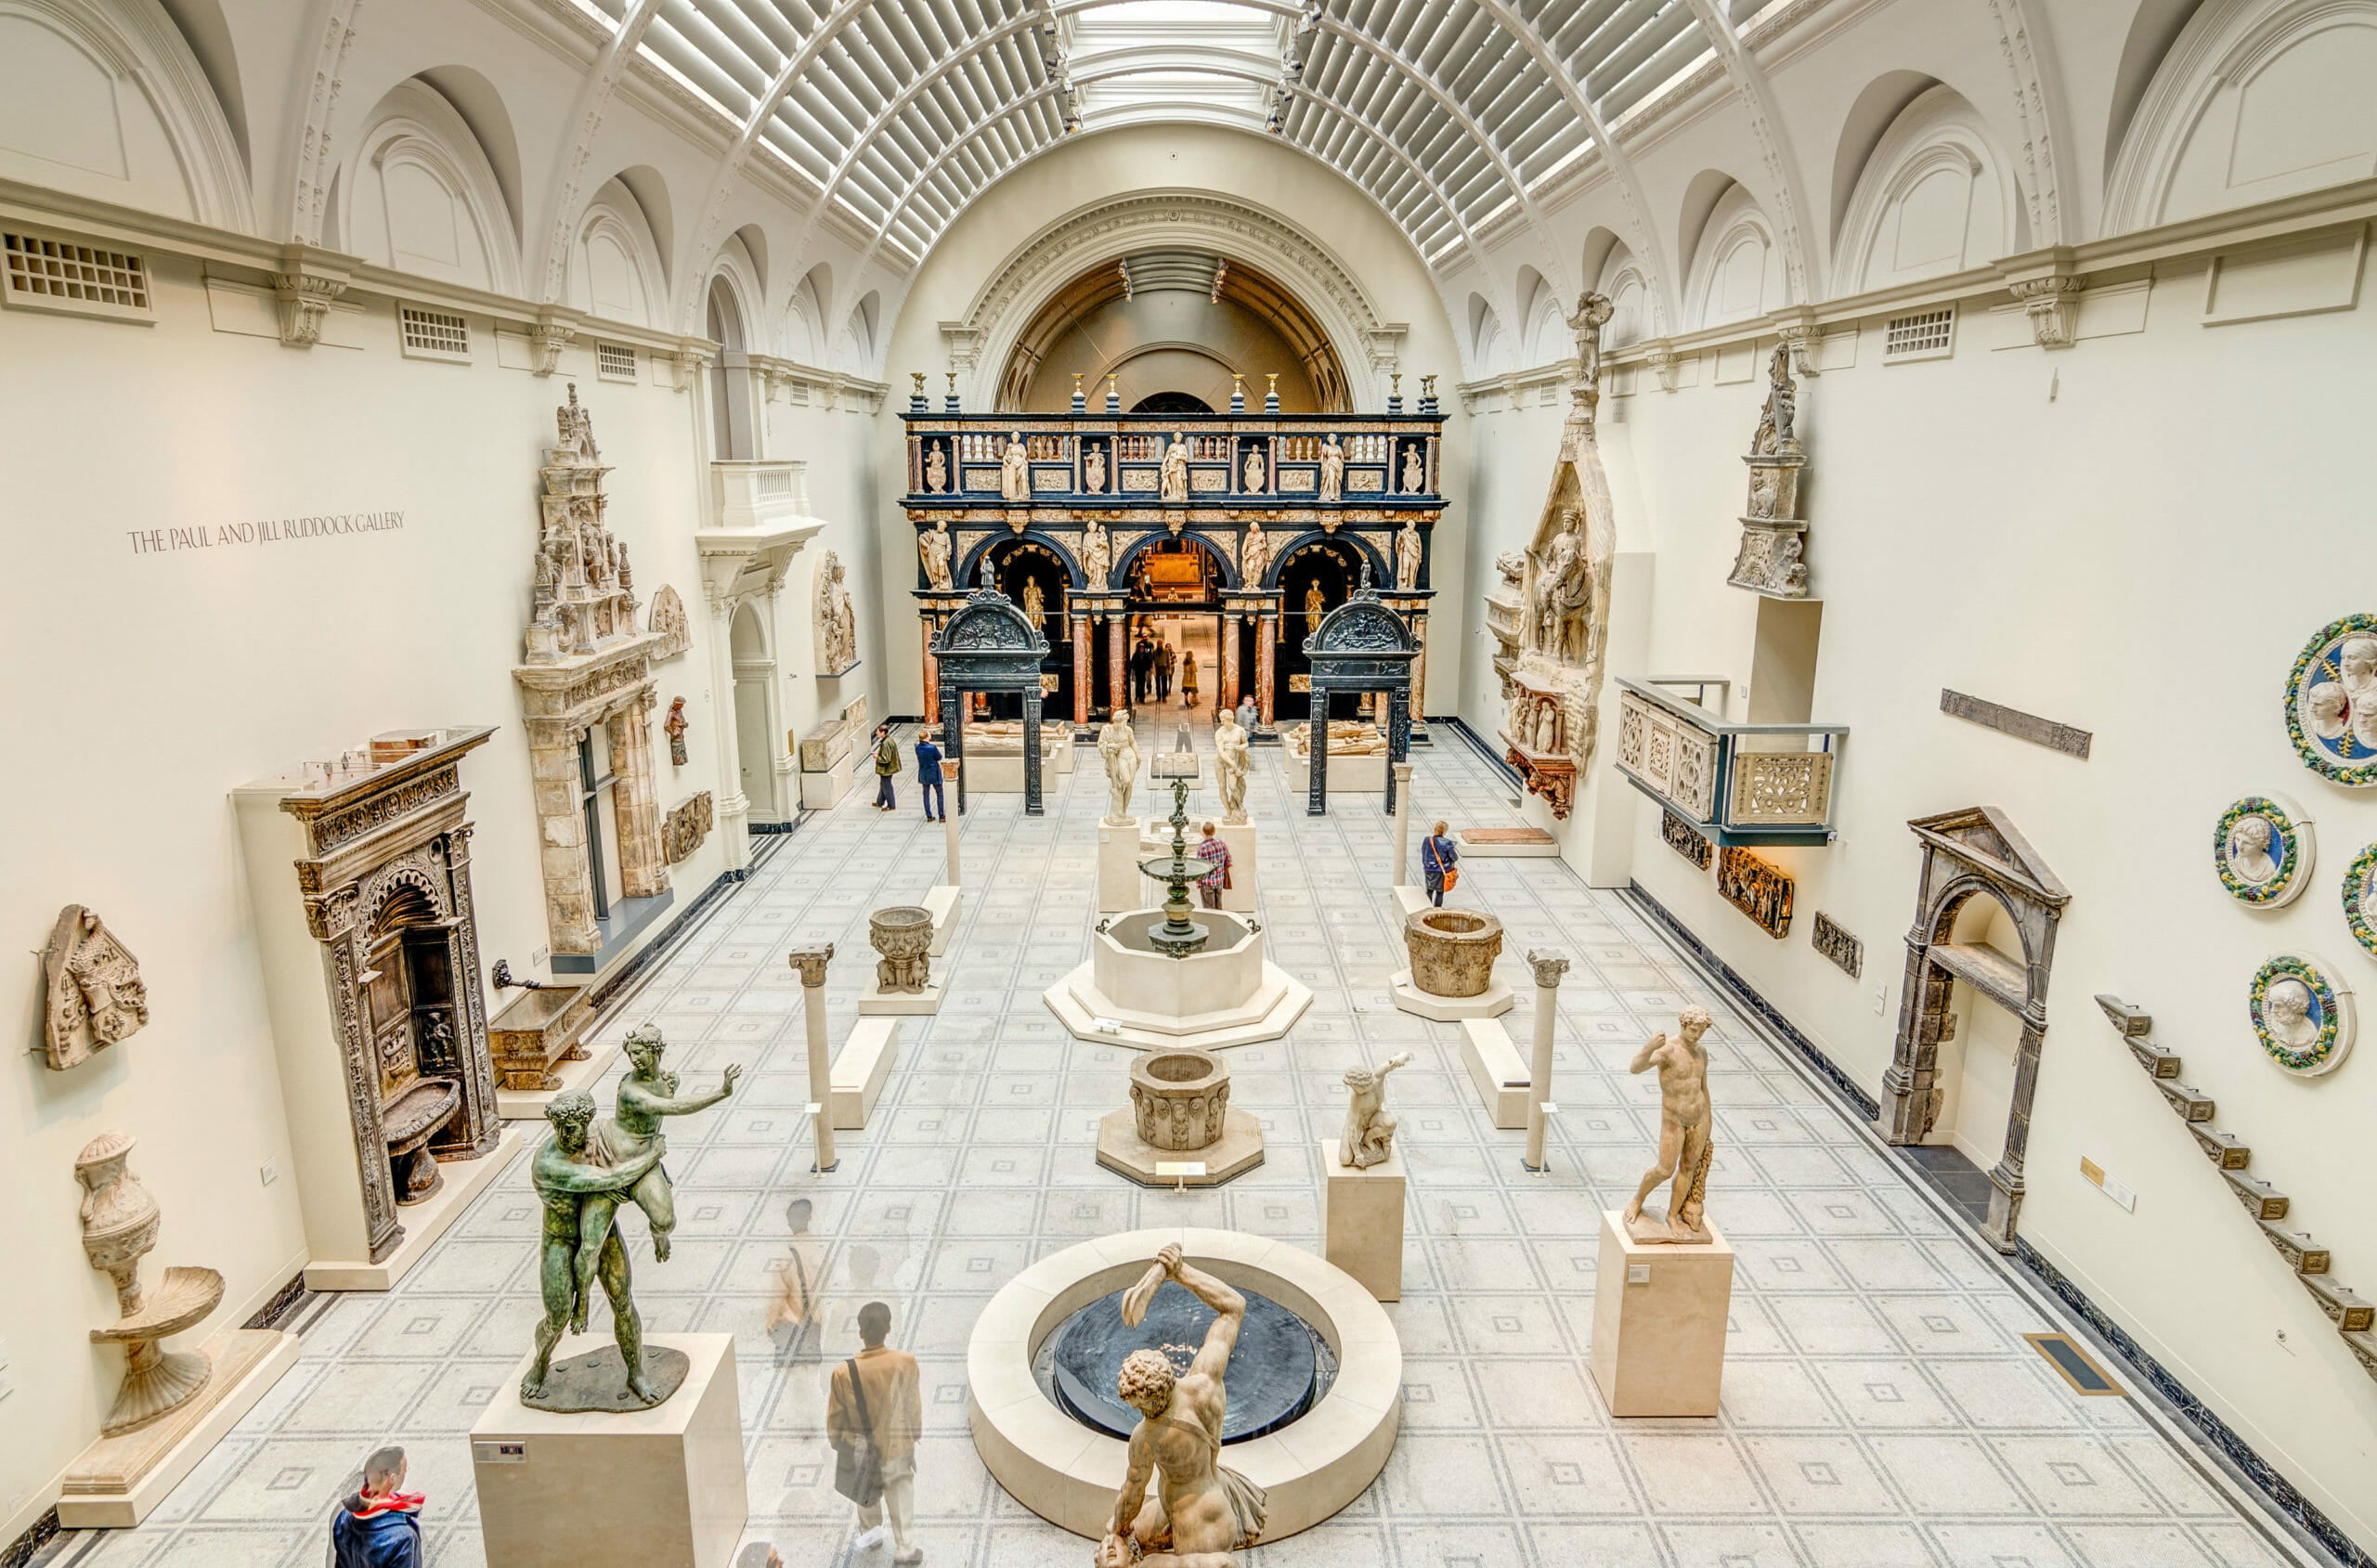 V&A Museum art galleries London